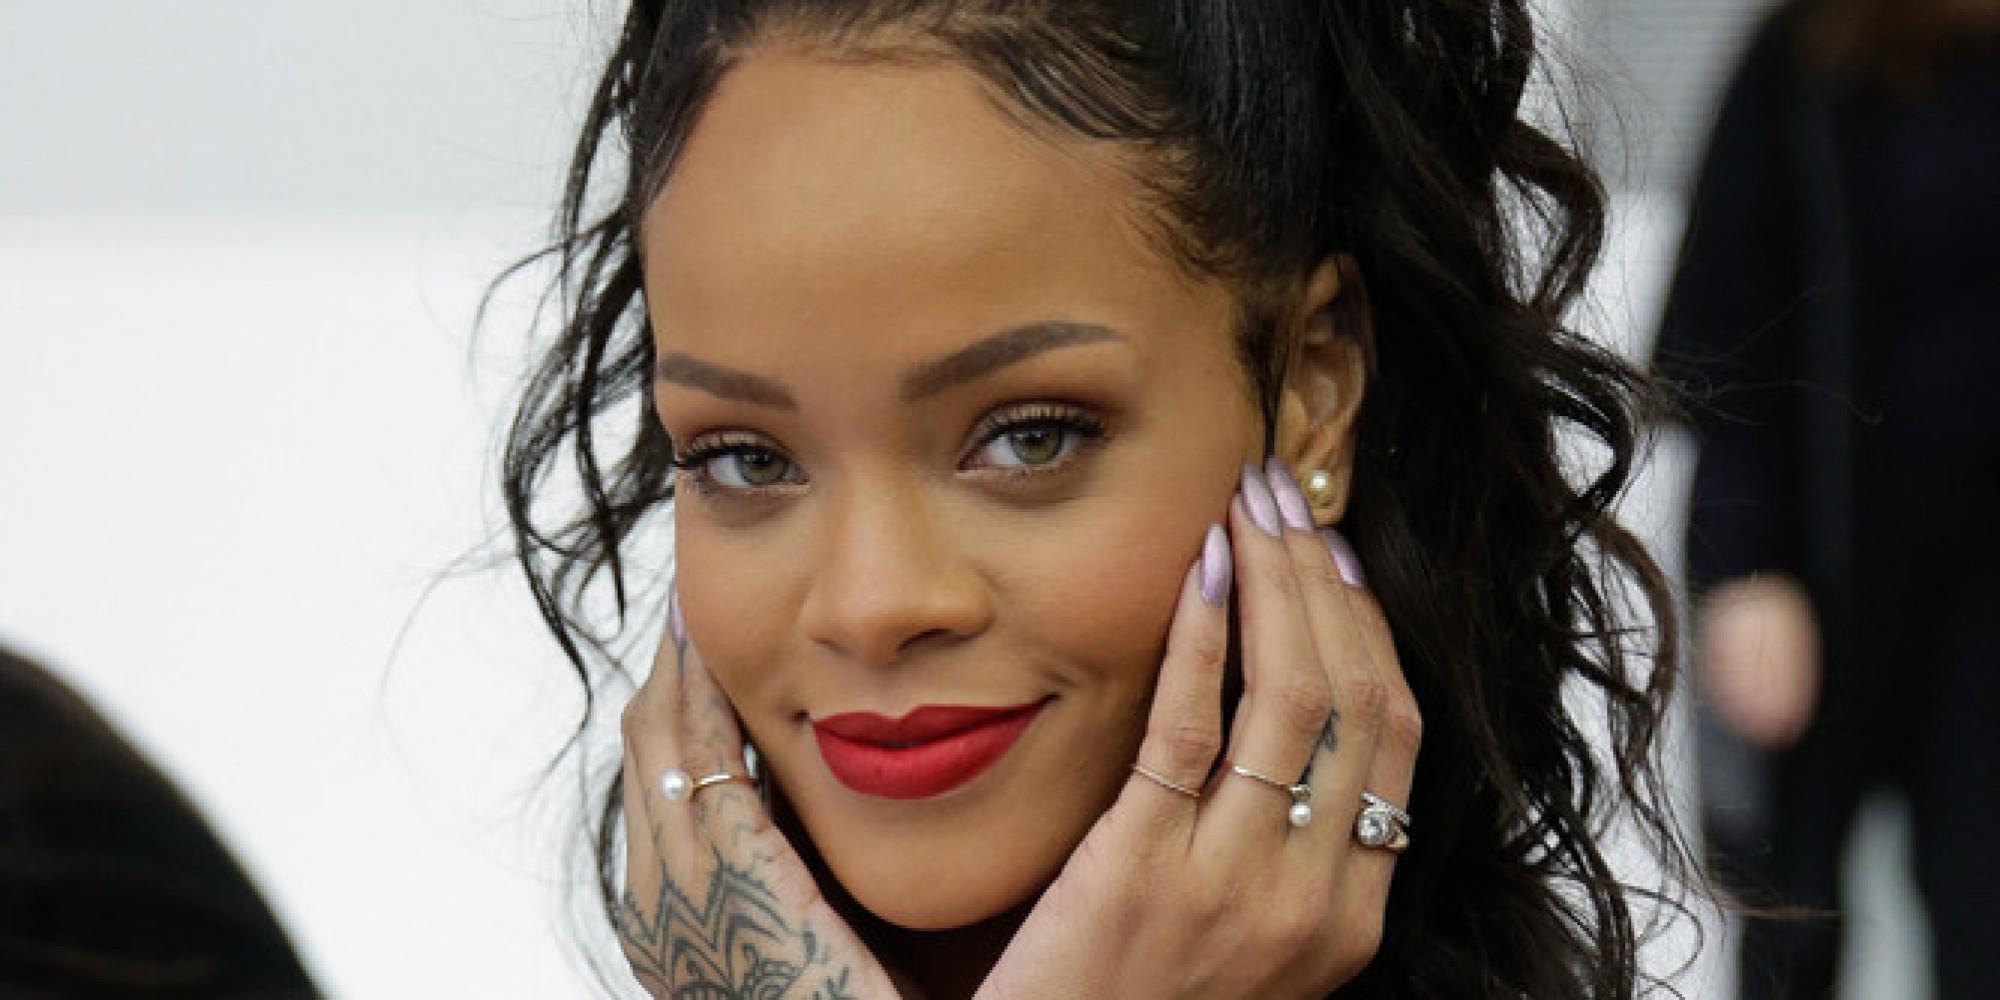 Rihanna: Rihanna Gets 'Pretty In Pink' For Christian Dior Cruise